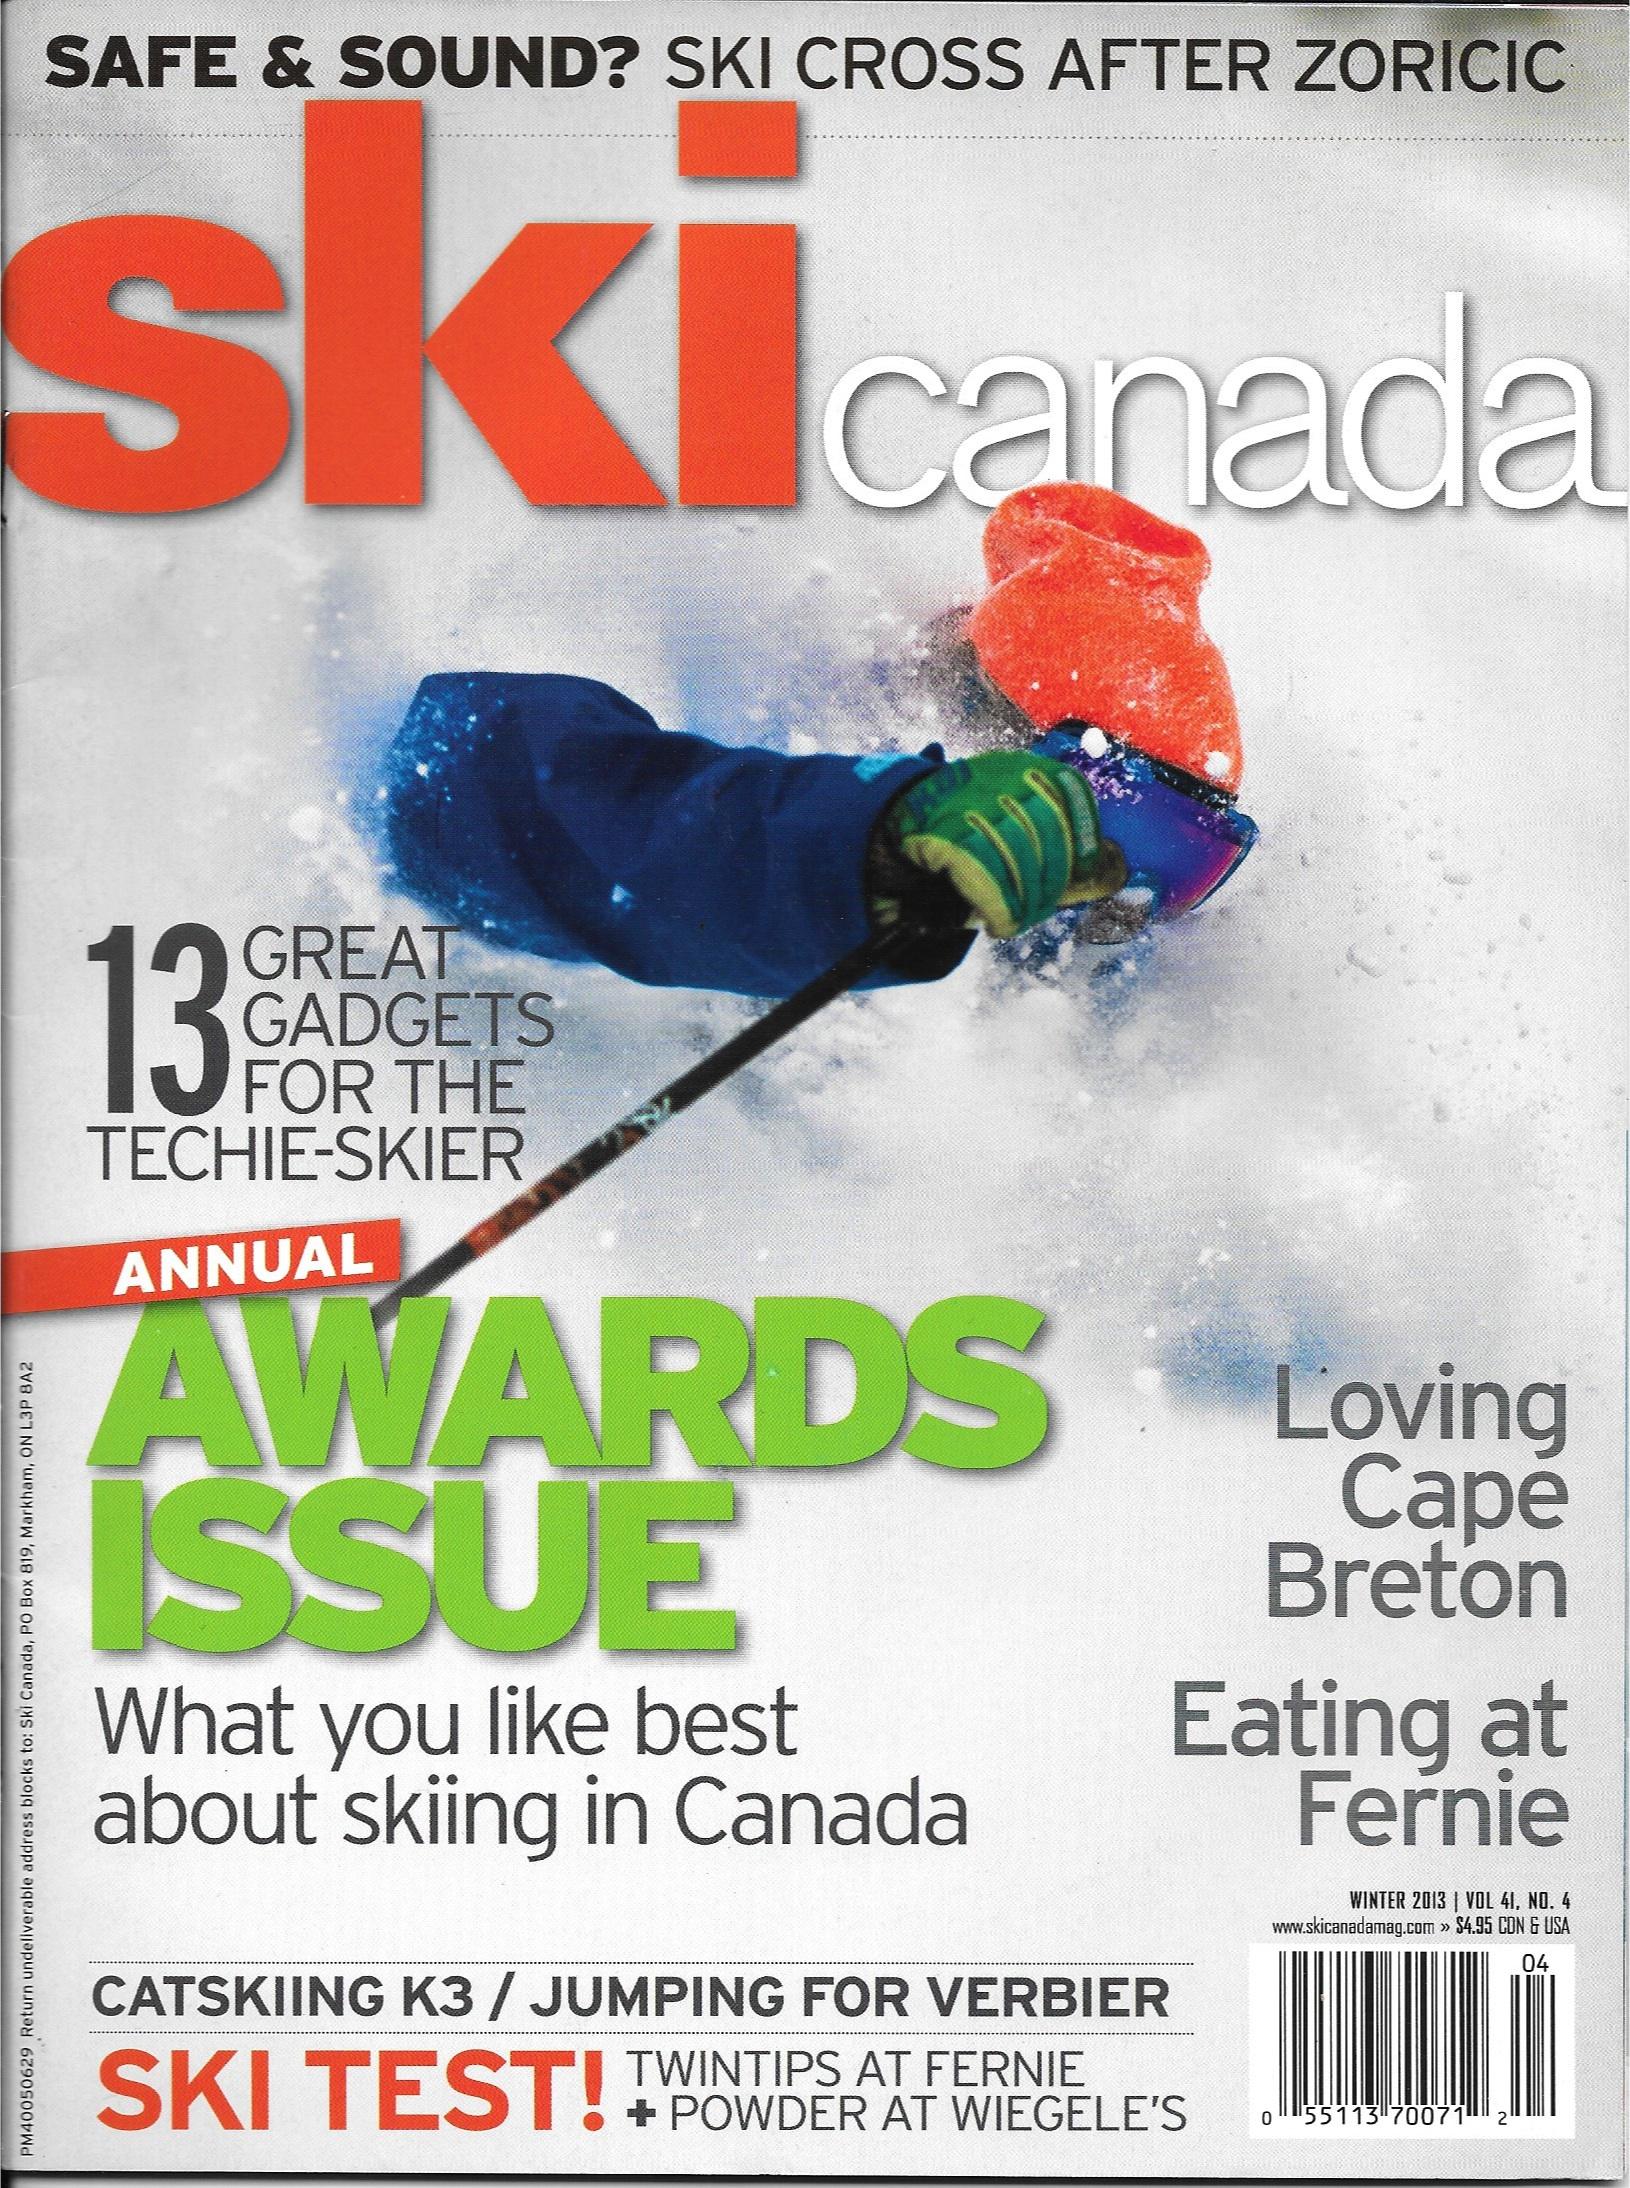 Ski Canada Winter 2013 - Photo by Grant Gunderson http://www.grantgunderson.com/